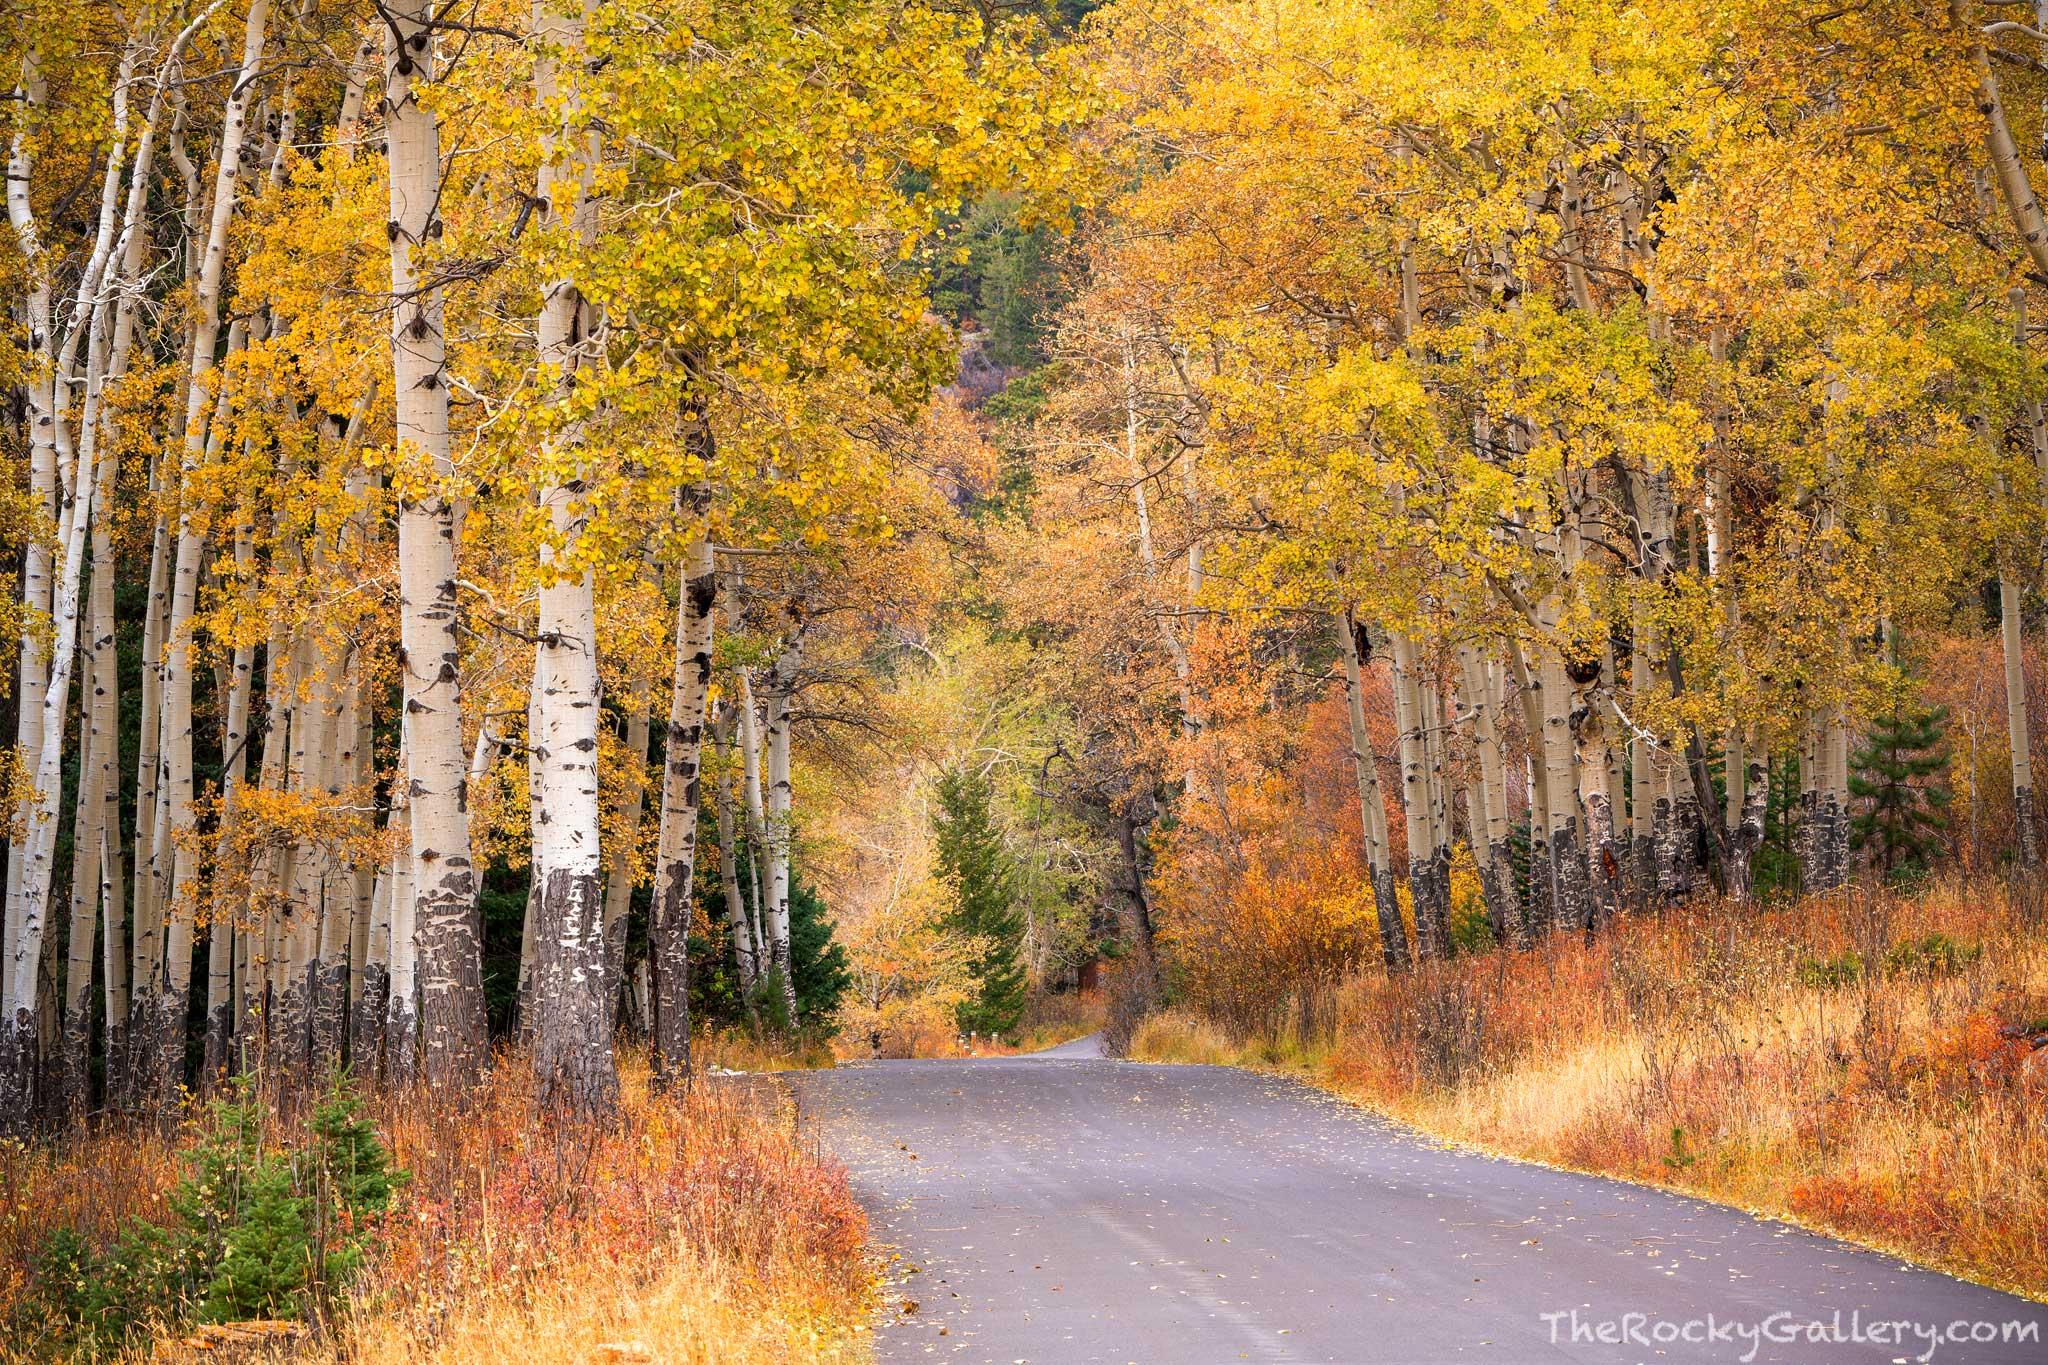 Old Fall River Road,Horseshoe Park,Estes Park,RMNP,Colorado,October,Autumn,Fall,Aspens,Elk,Landscape,Photography,Rocky Mountain National Park,Trail Ridge Road,Road,Hand of Man , photo